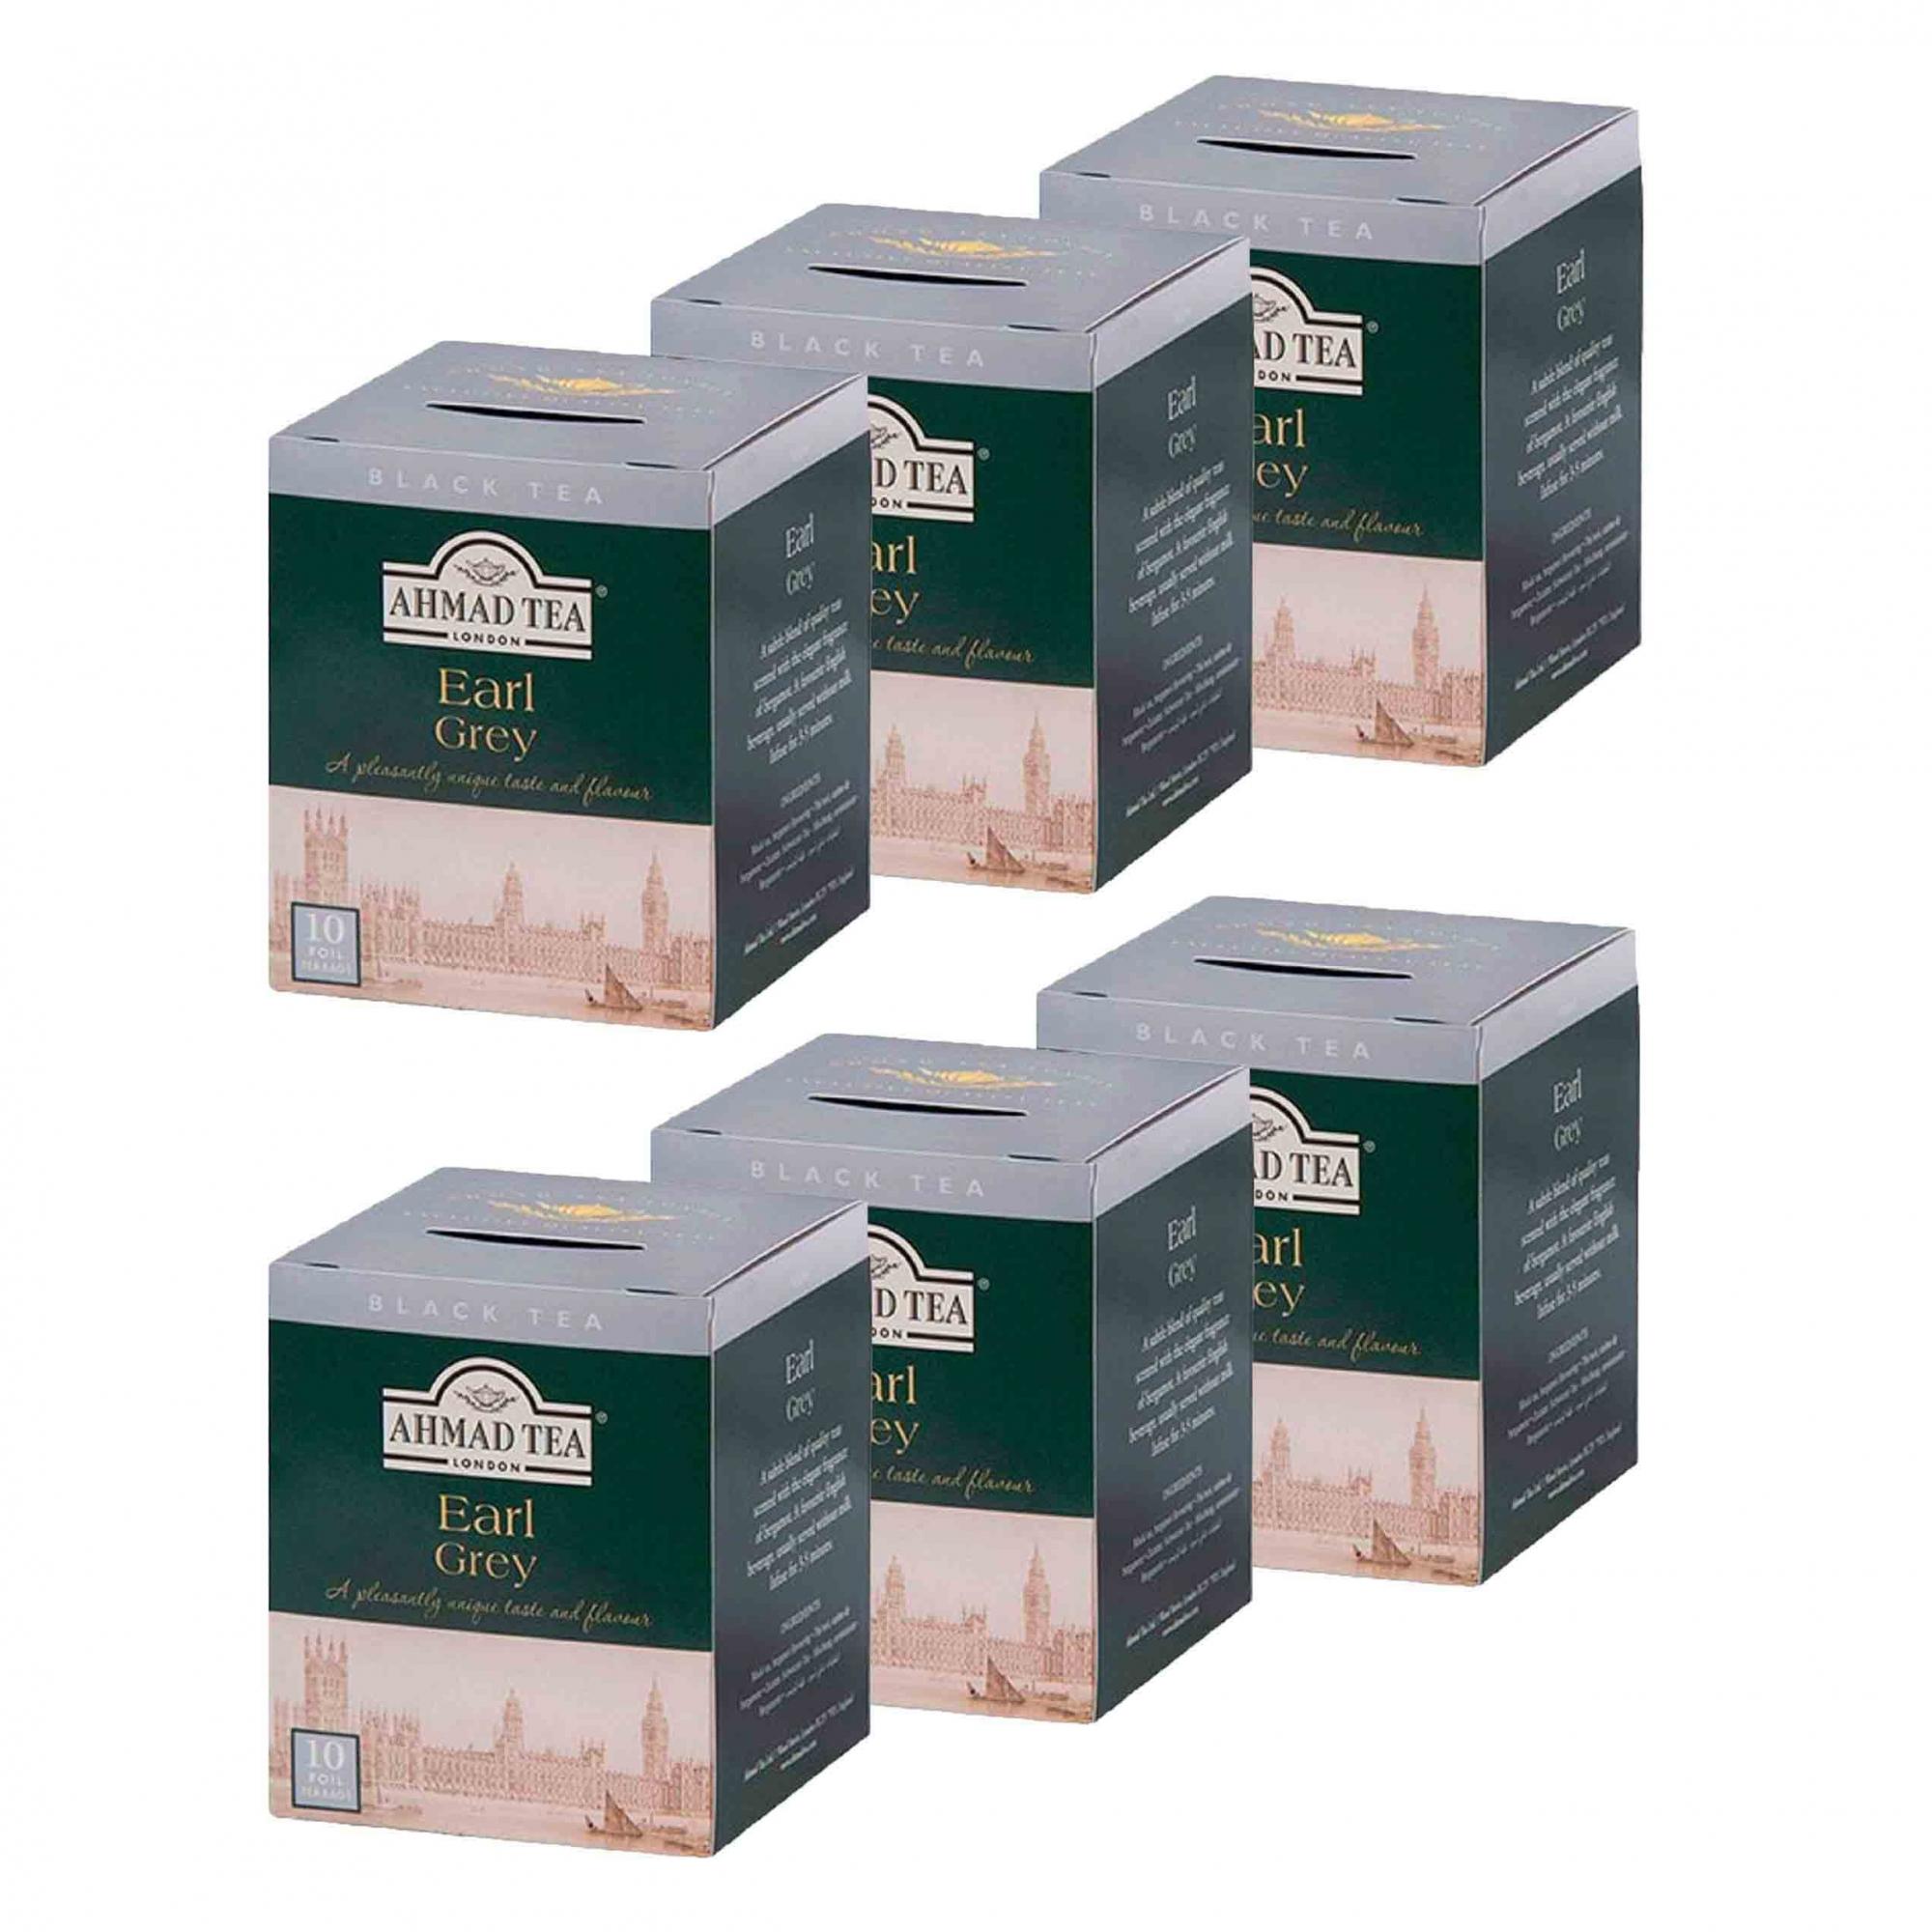 Kit 6 Caixas com 10 Sachês de Chá Earl Grey Ahmad Tea 20g